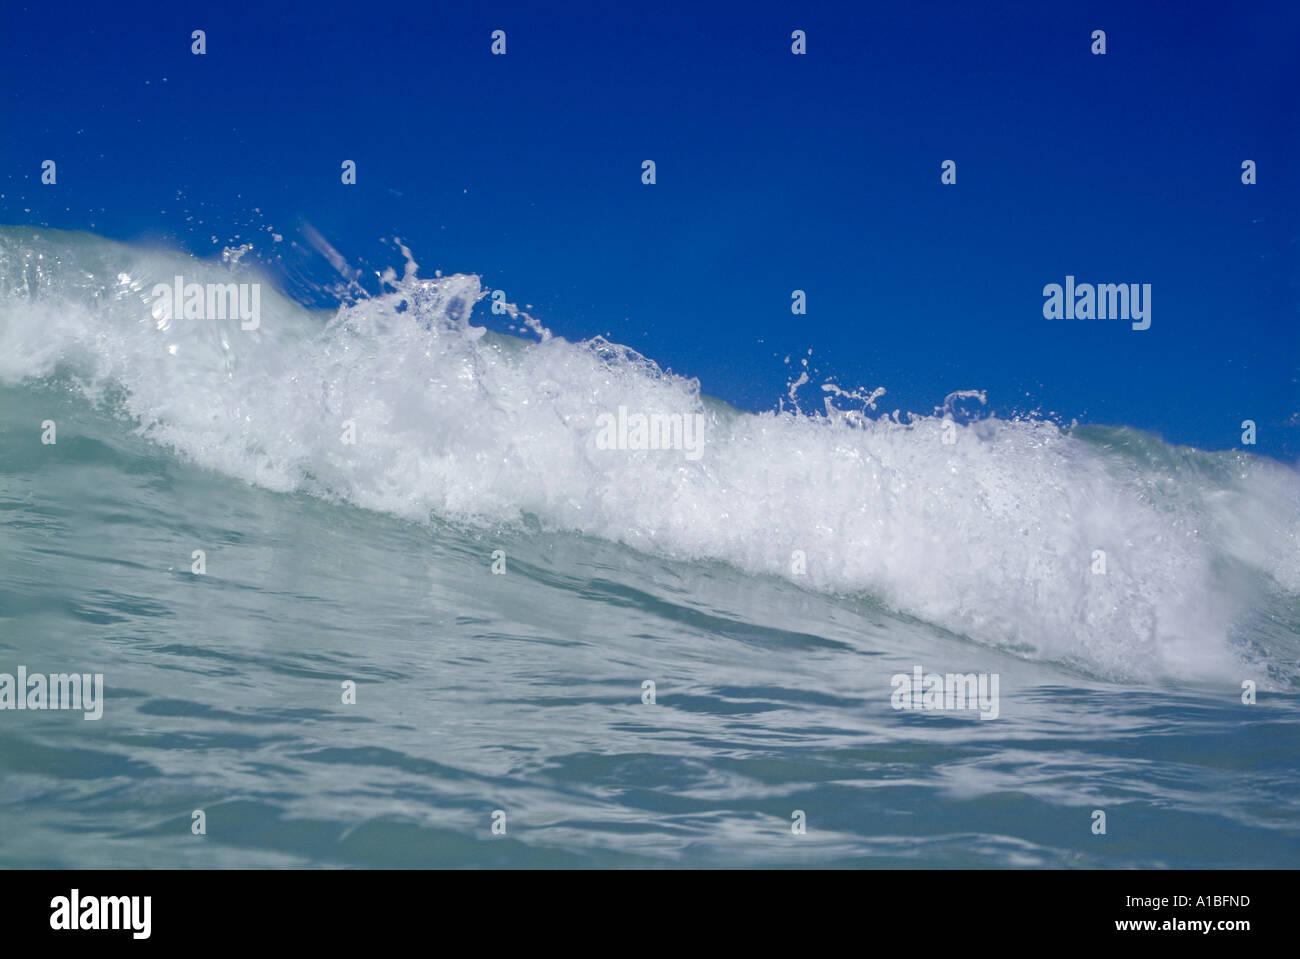 Crashing foamy waves in the blue ocean waters. - Stock Image